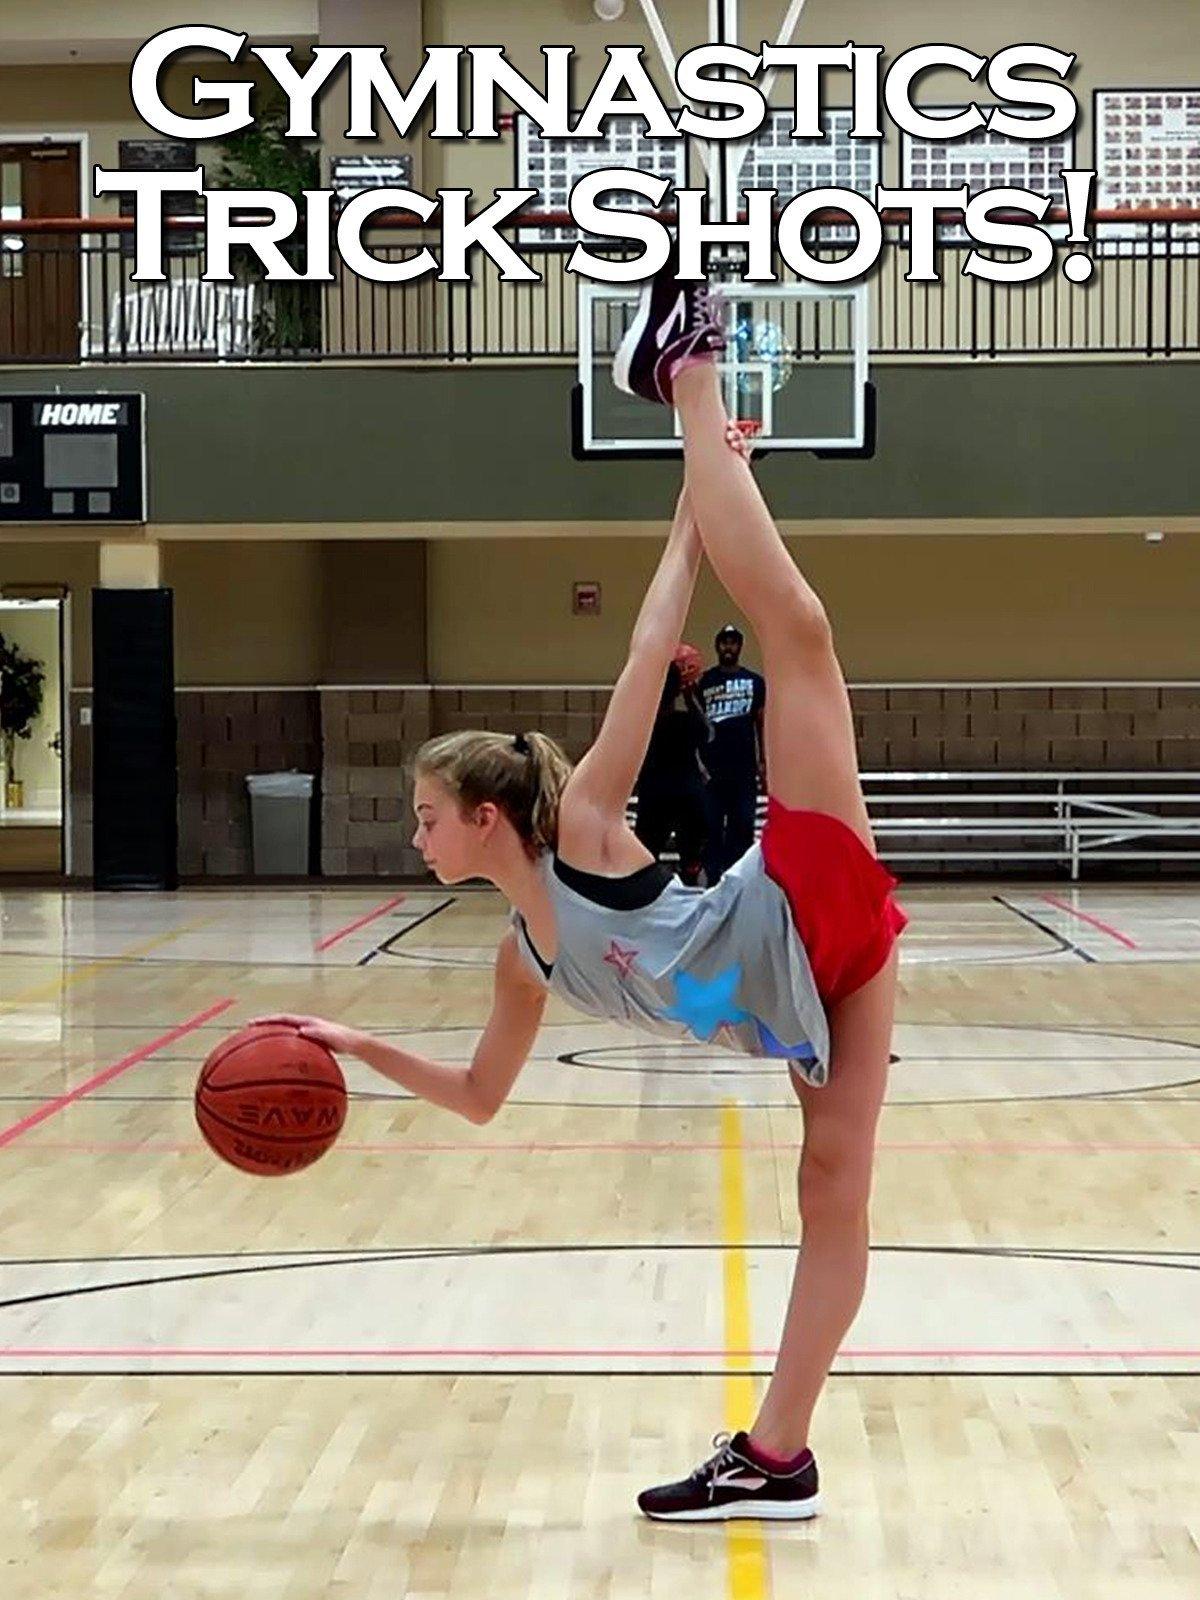 Gymnastics Trick Shots! on Amazon Prime Video UK